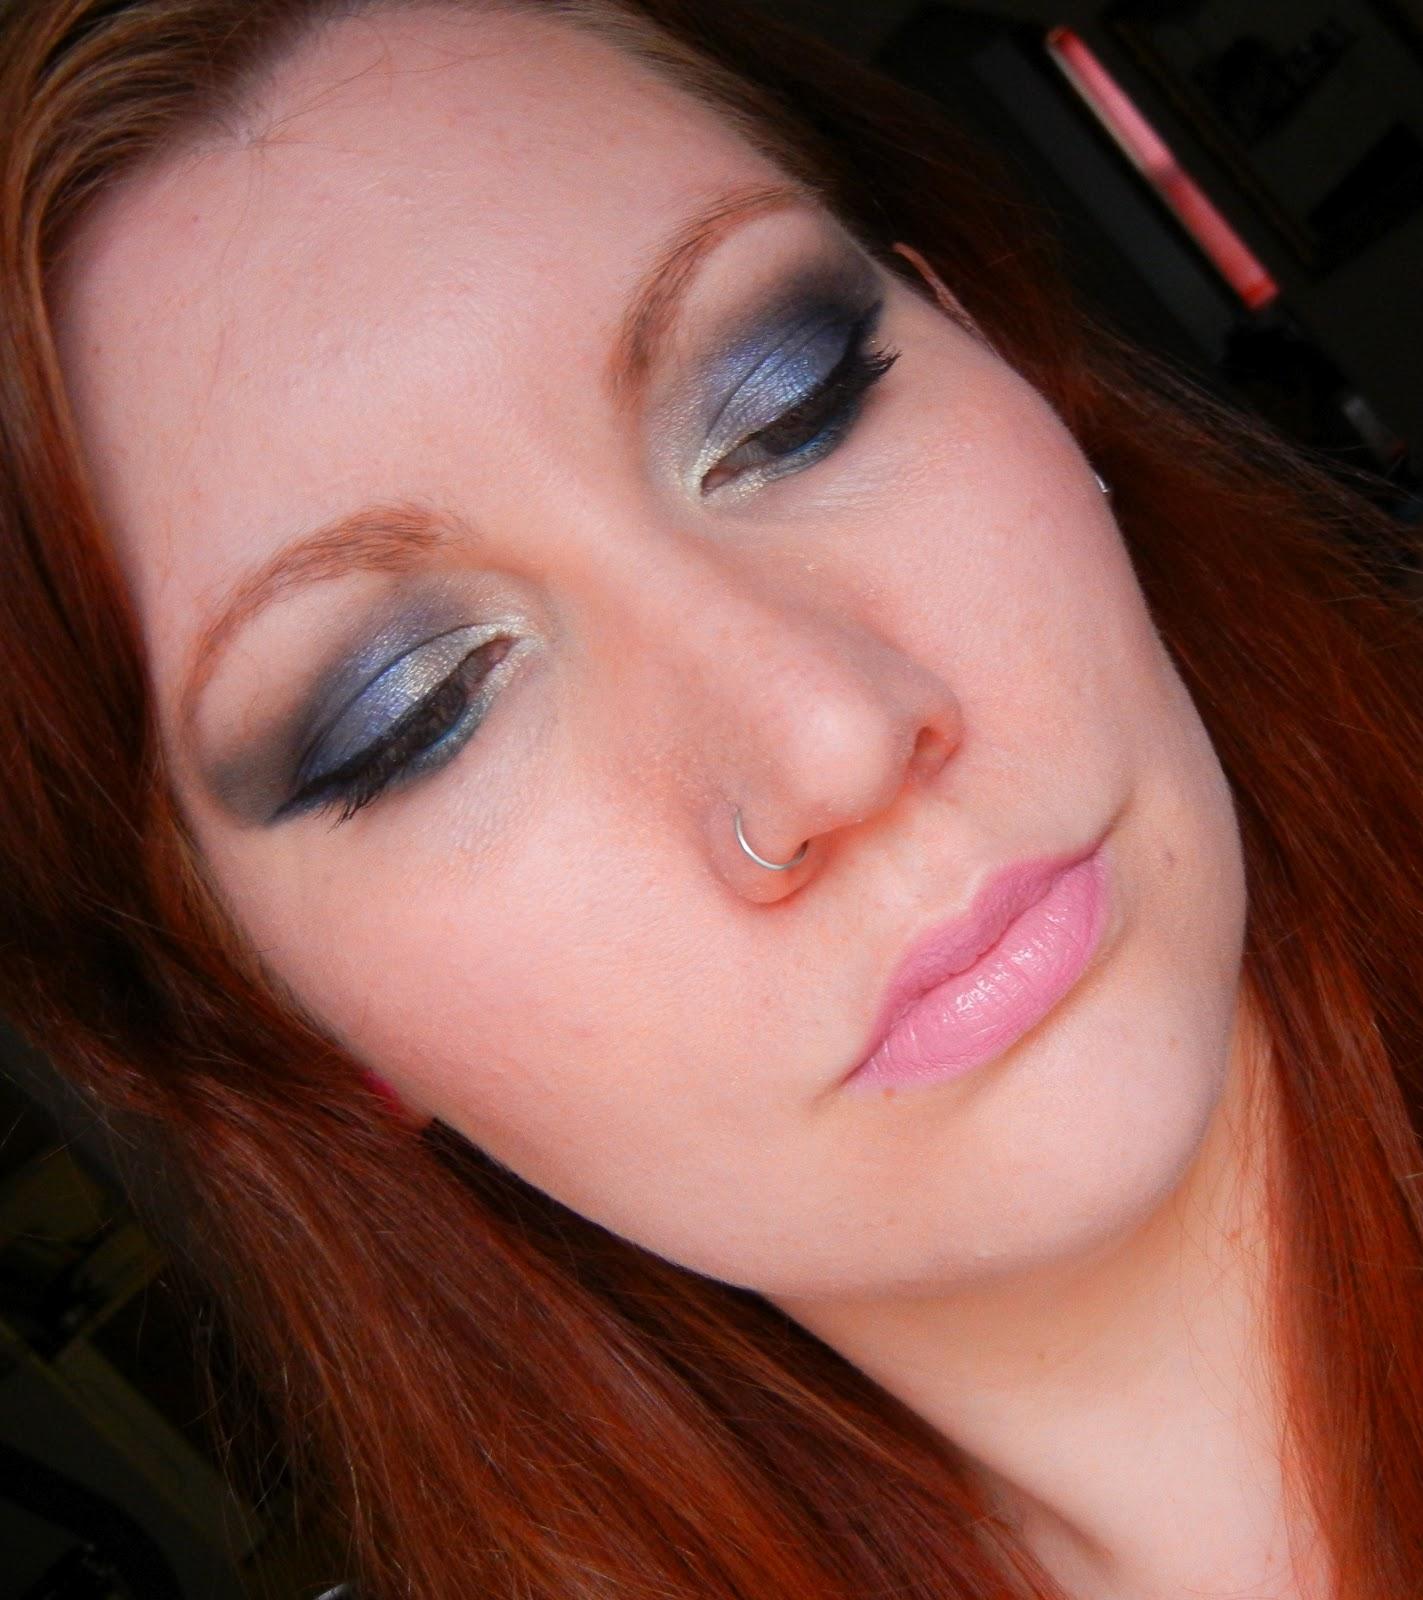 How To Apply Bright Eye Makeup Video Dramatic Cosmopolitan Formal Eye Makeup  Step By Step Tutorial